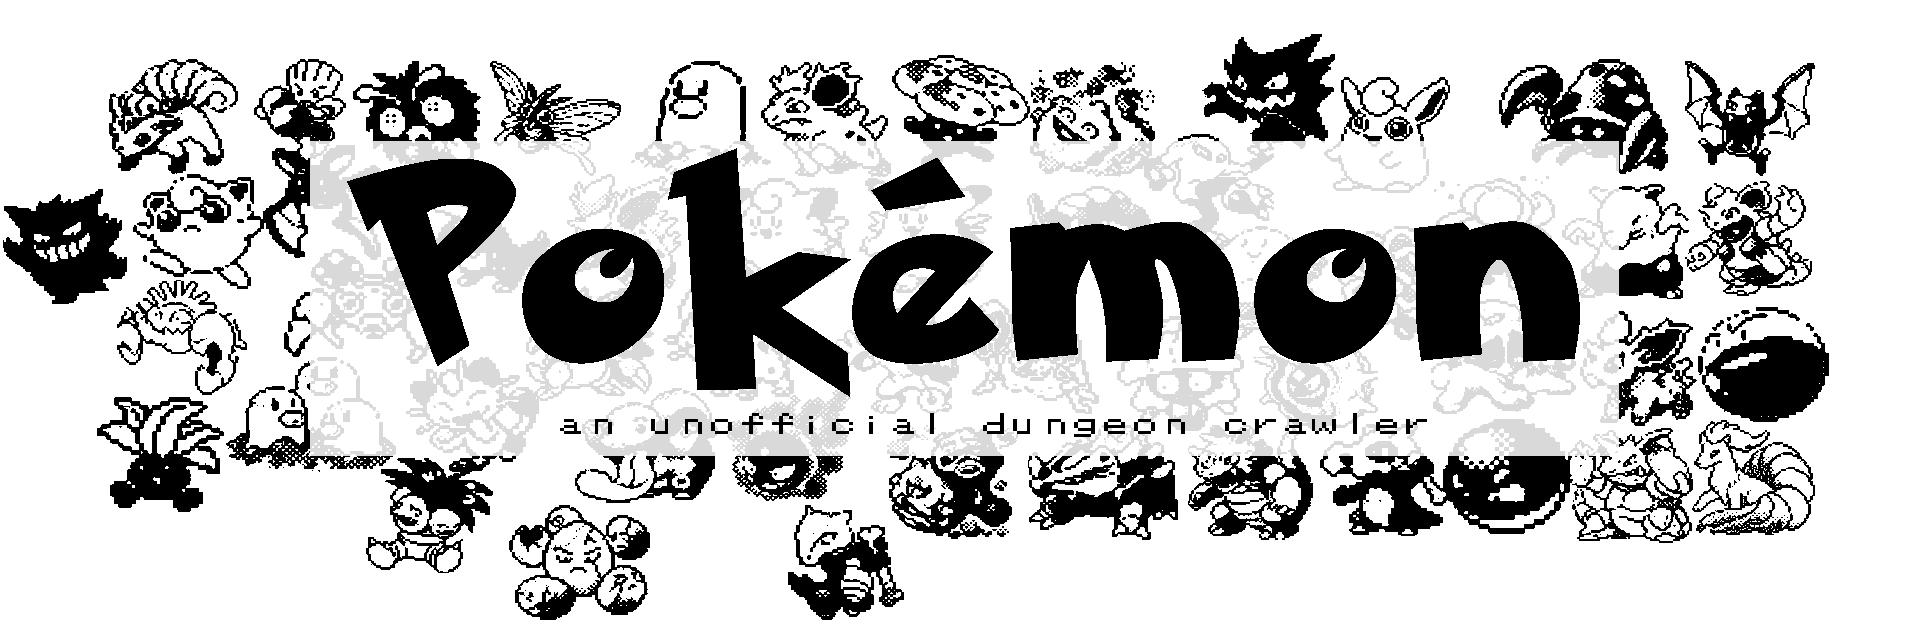 Pokemon Dungeon Crawler